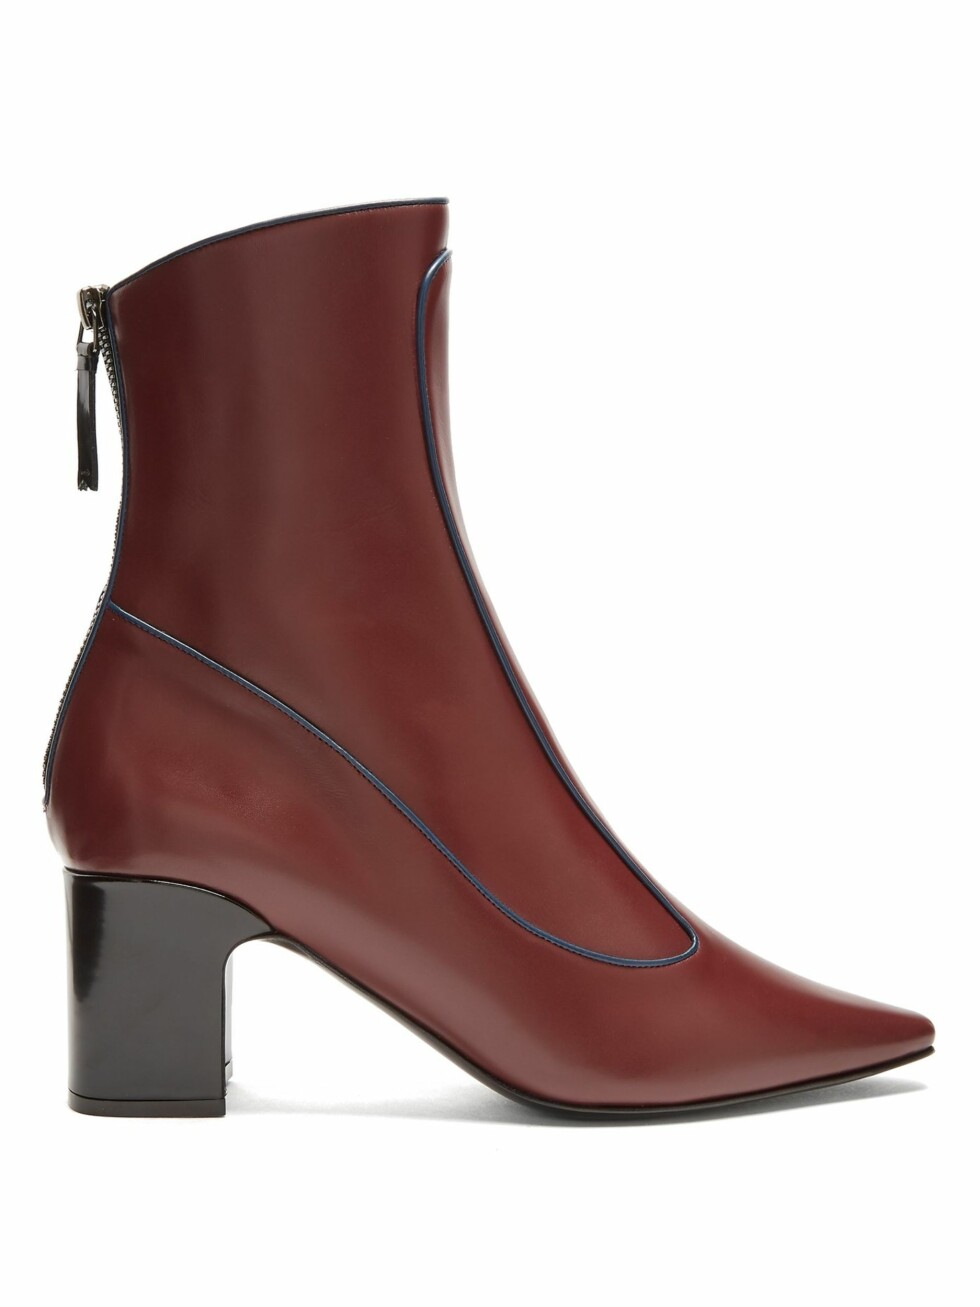 Fabrizio Viti via Matchesfashion |4100,-| https://www.matchesfashion.com/intl/products/Fabrizio-Viti-Winter-Timeless-leather-ankle-boots-1169850